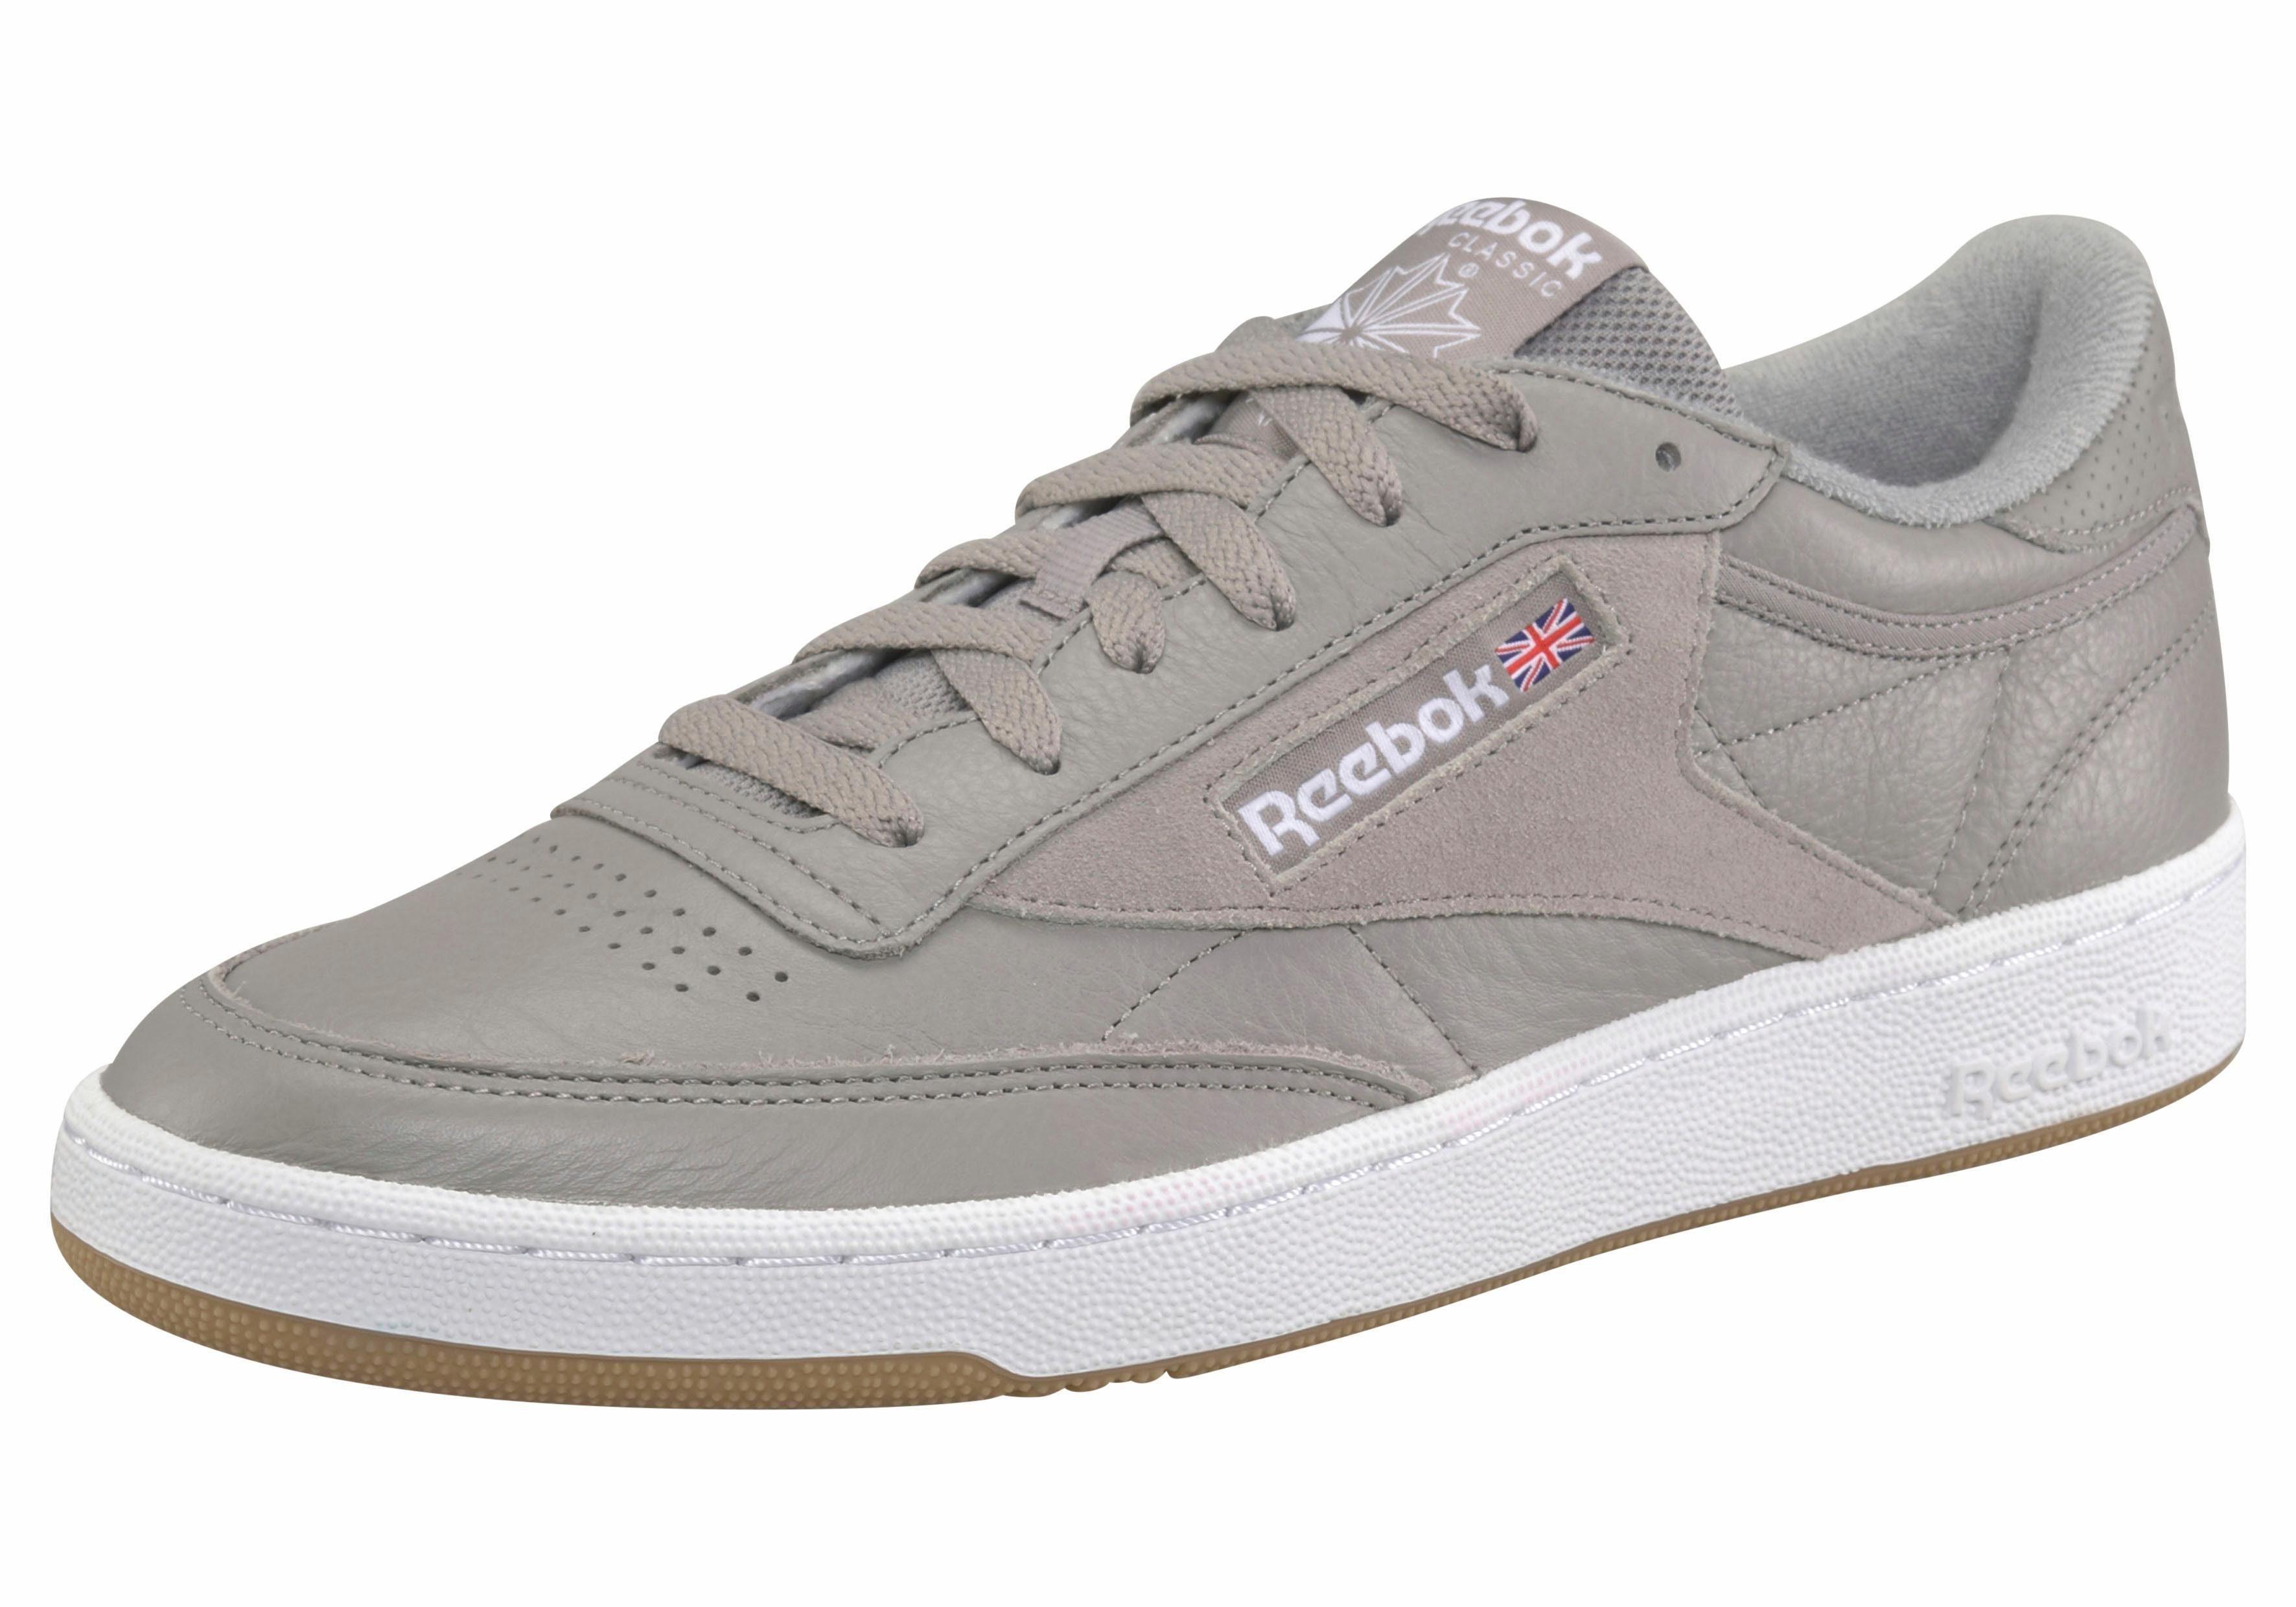 Reebok Club 85 C Chaussures Estl Gris IB8NU